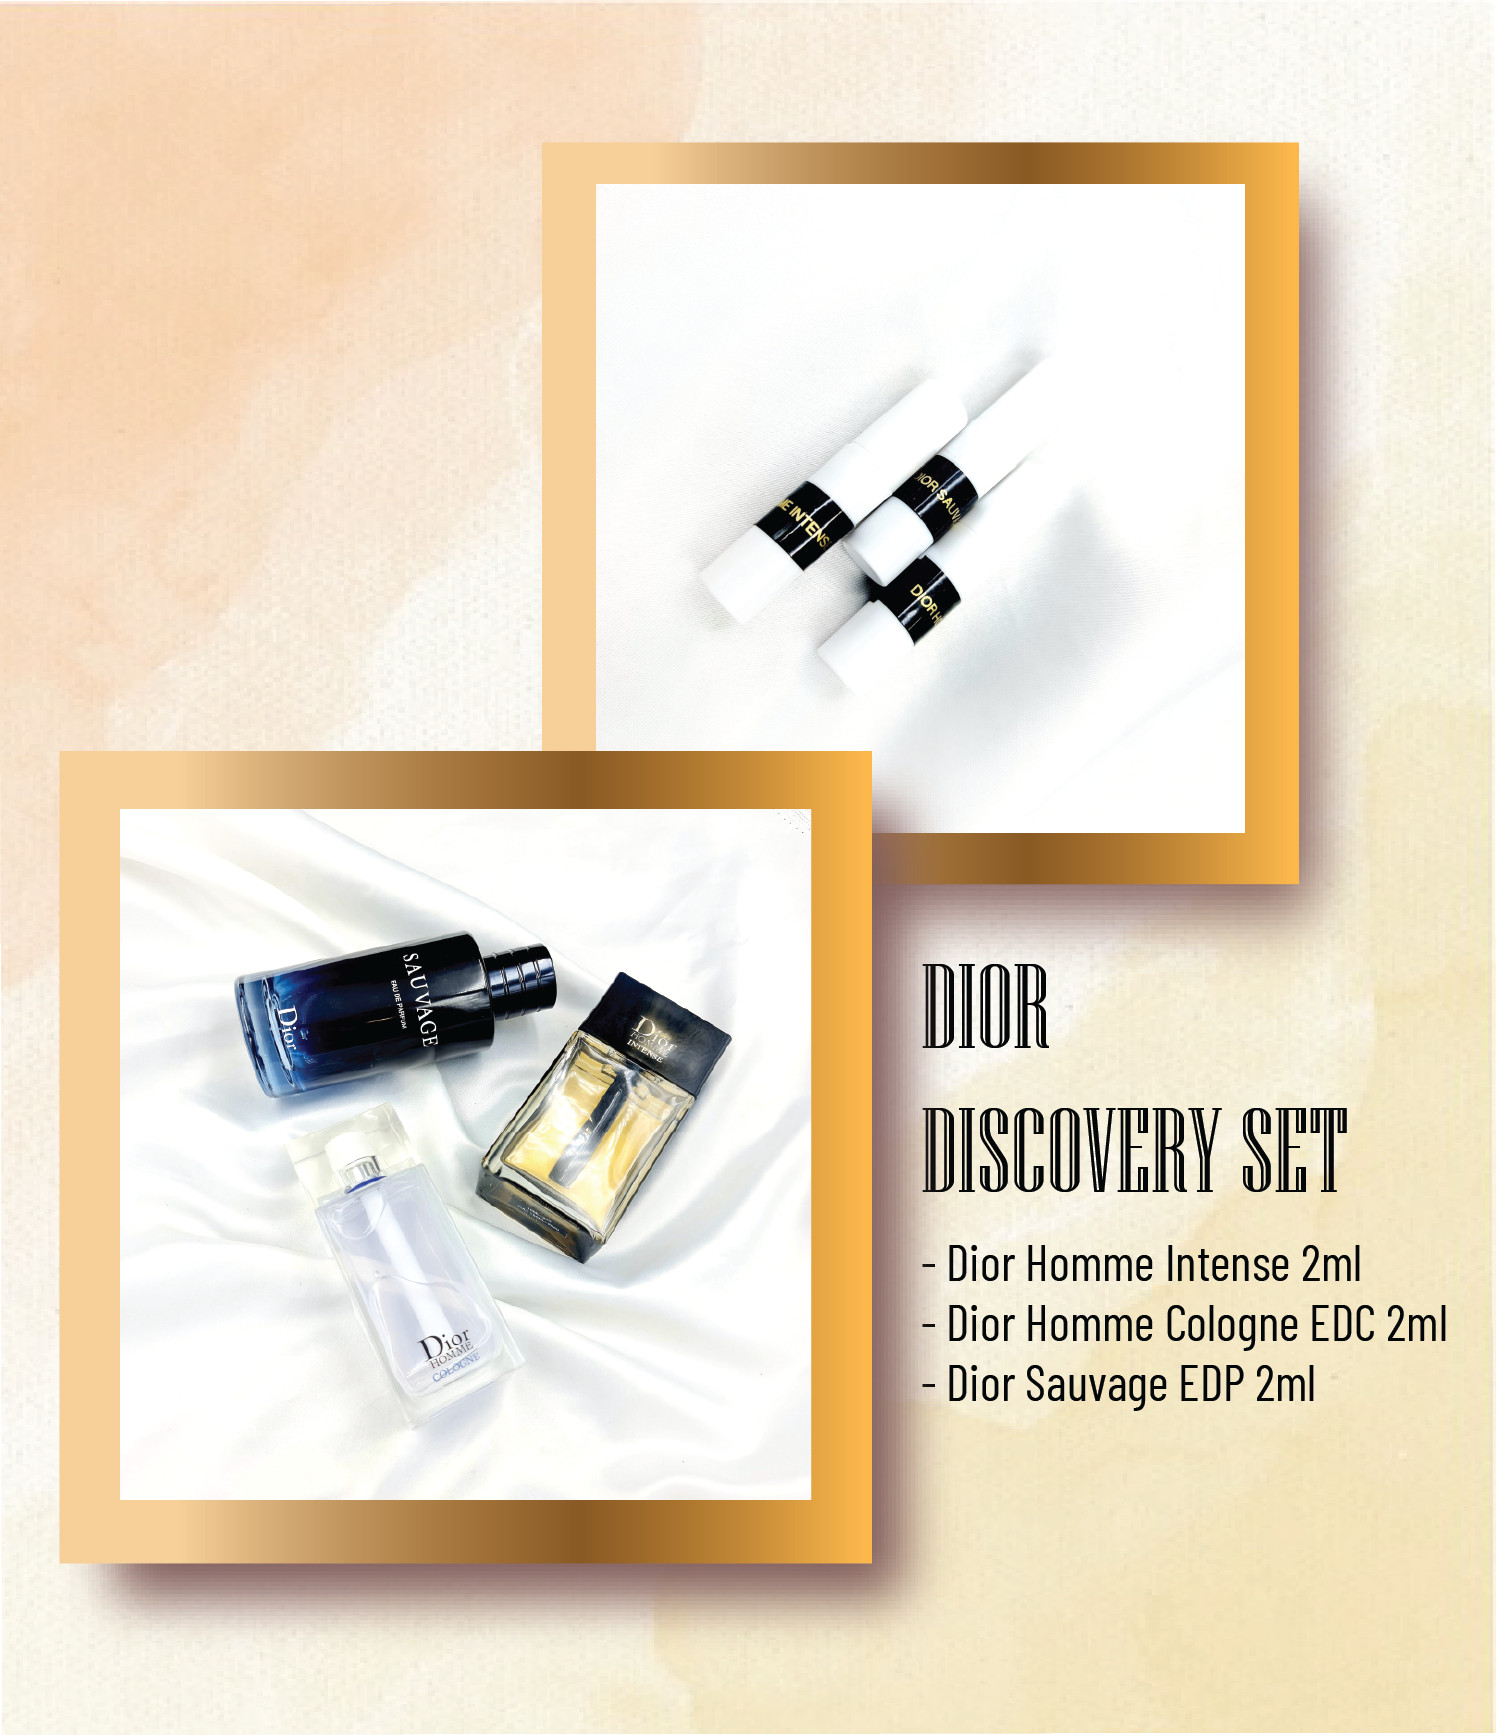 Discovey Set DIOR (Dior Homme Intense 2ml + Dior Sauvage EDP 2ml + Dior Homme Cologne 2ml)